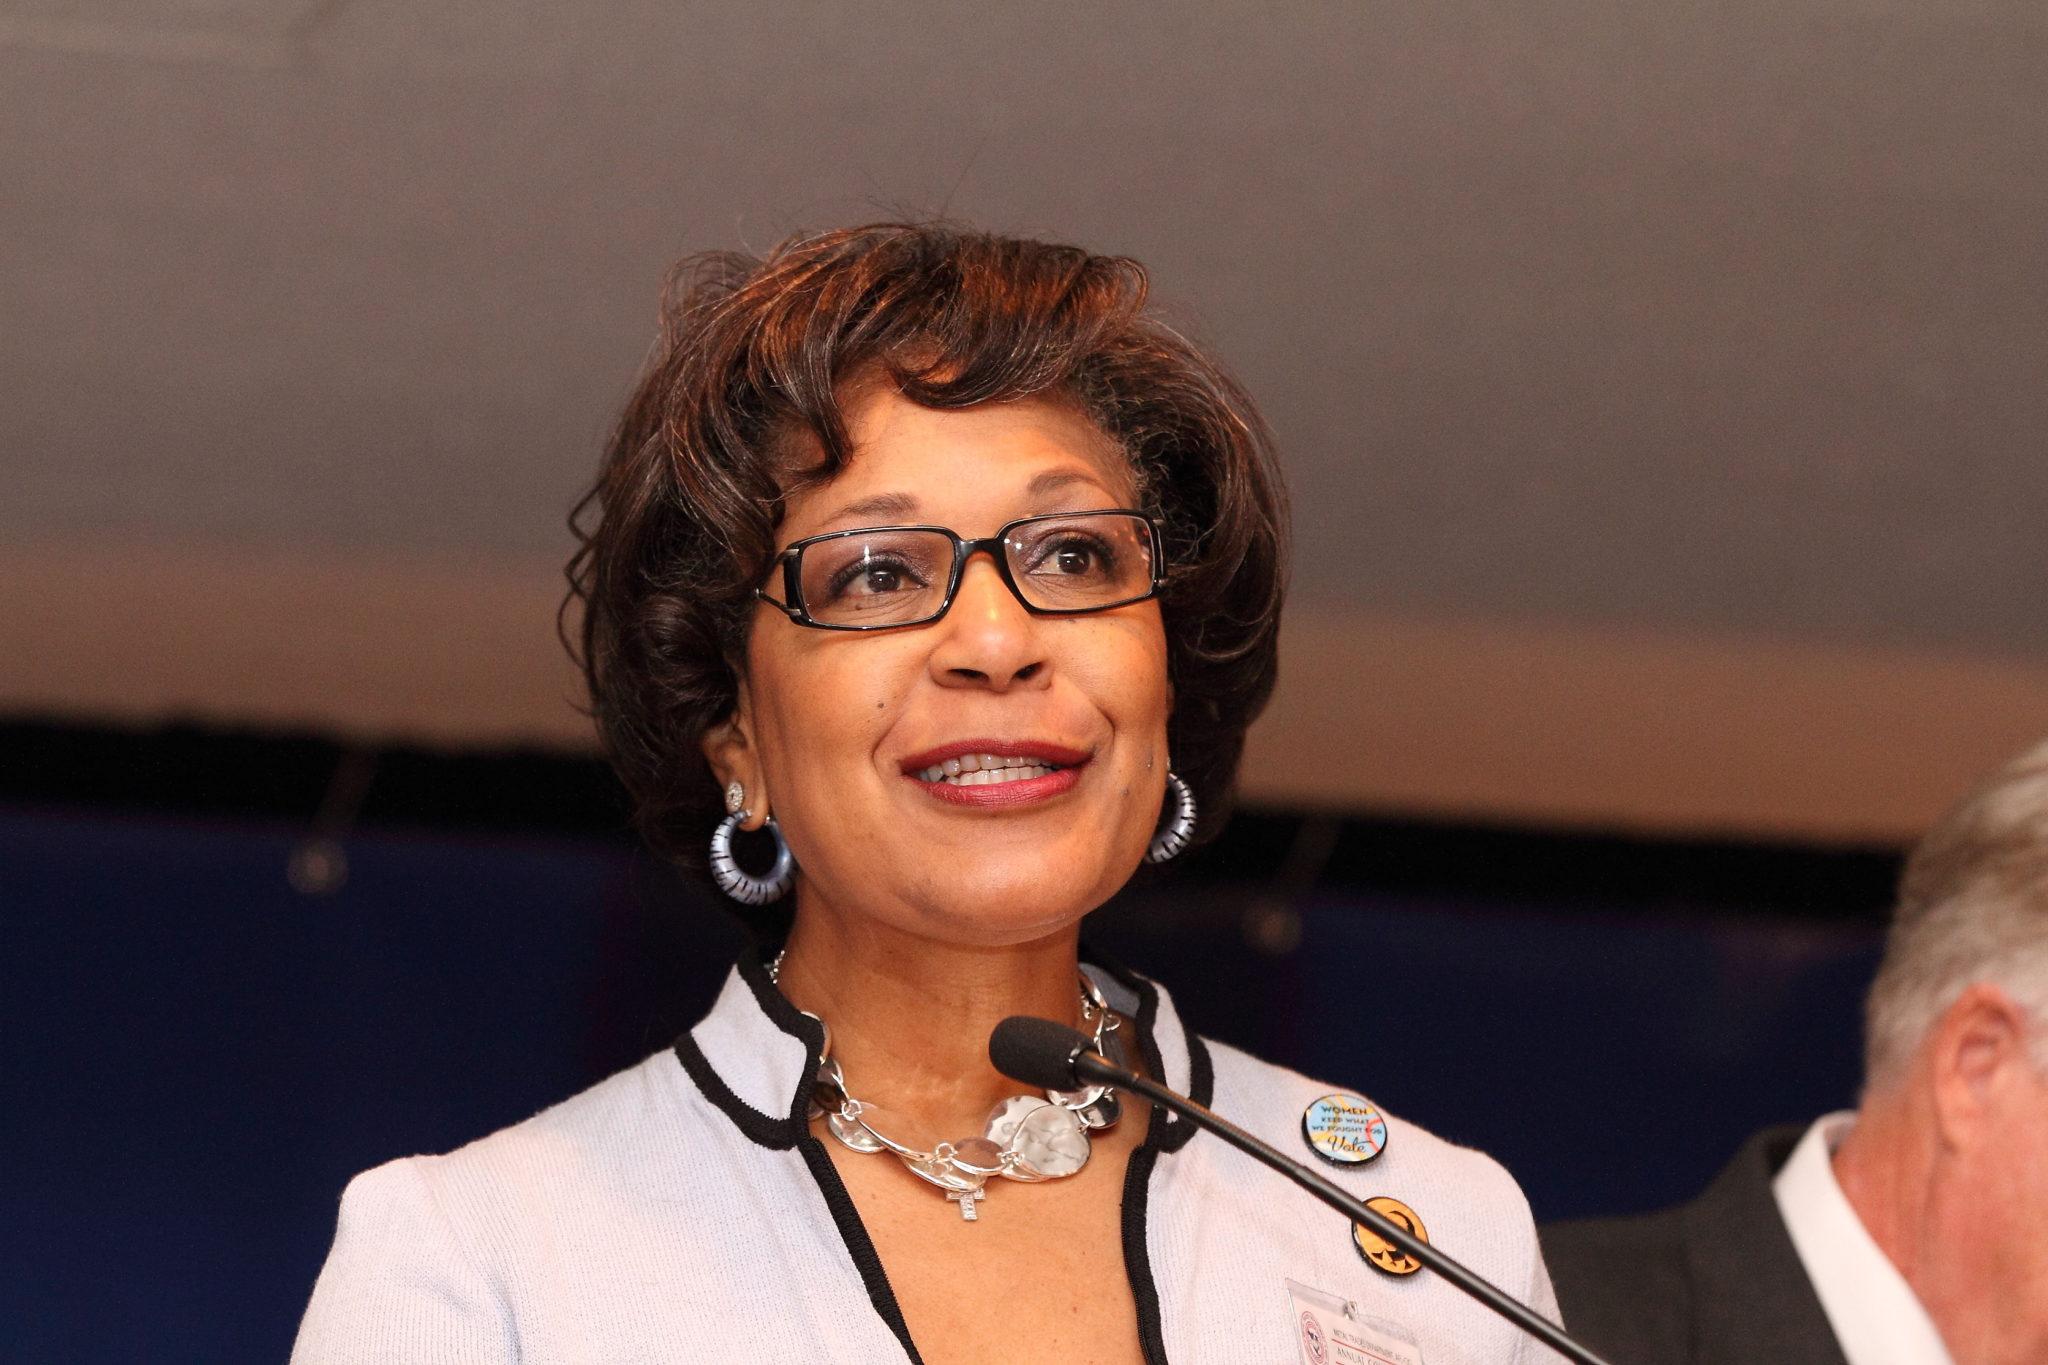 Arlene Holt Baker, AFL-CIO